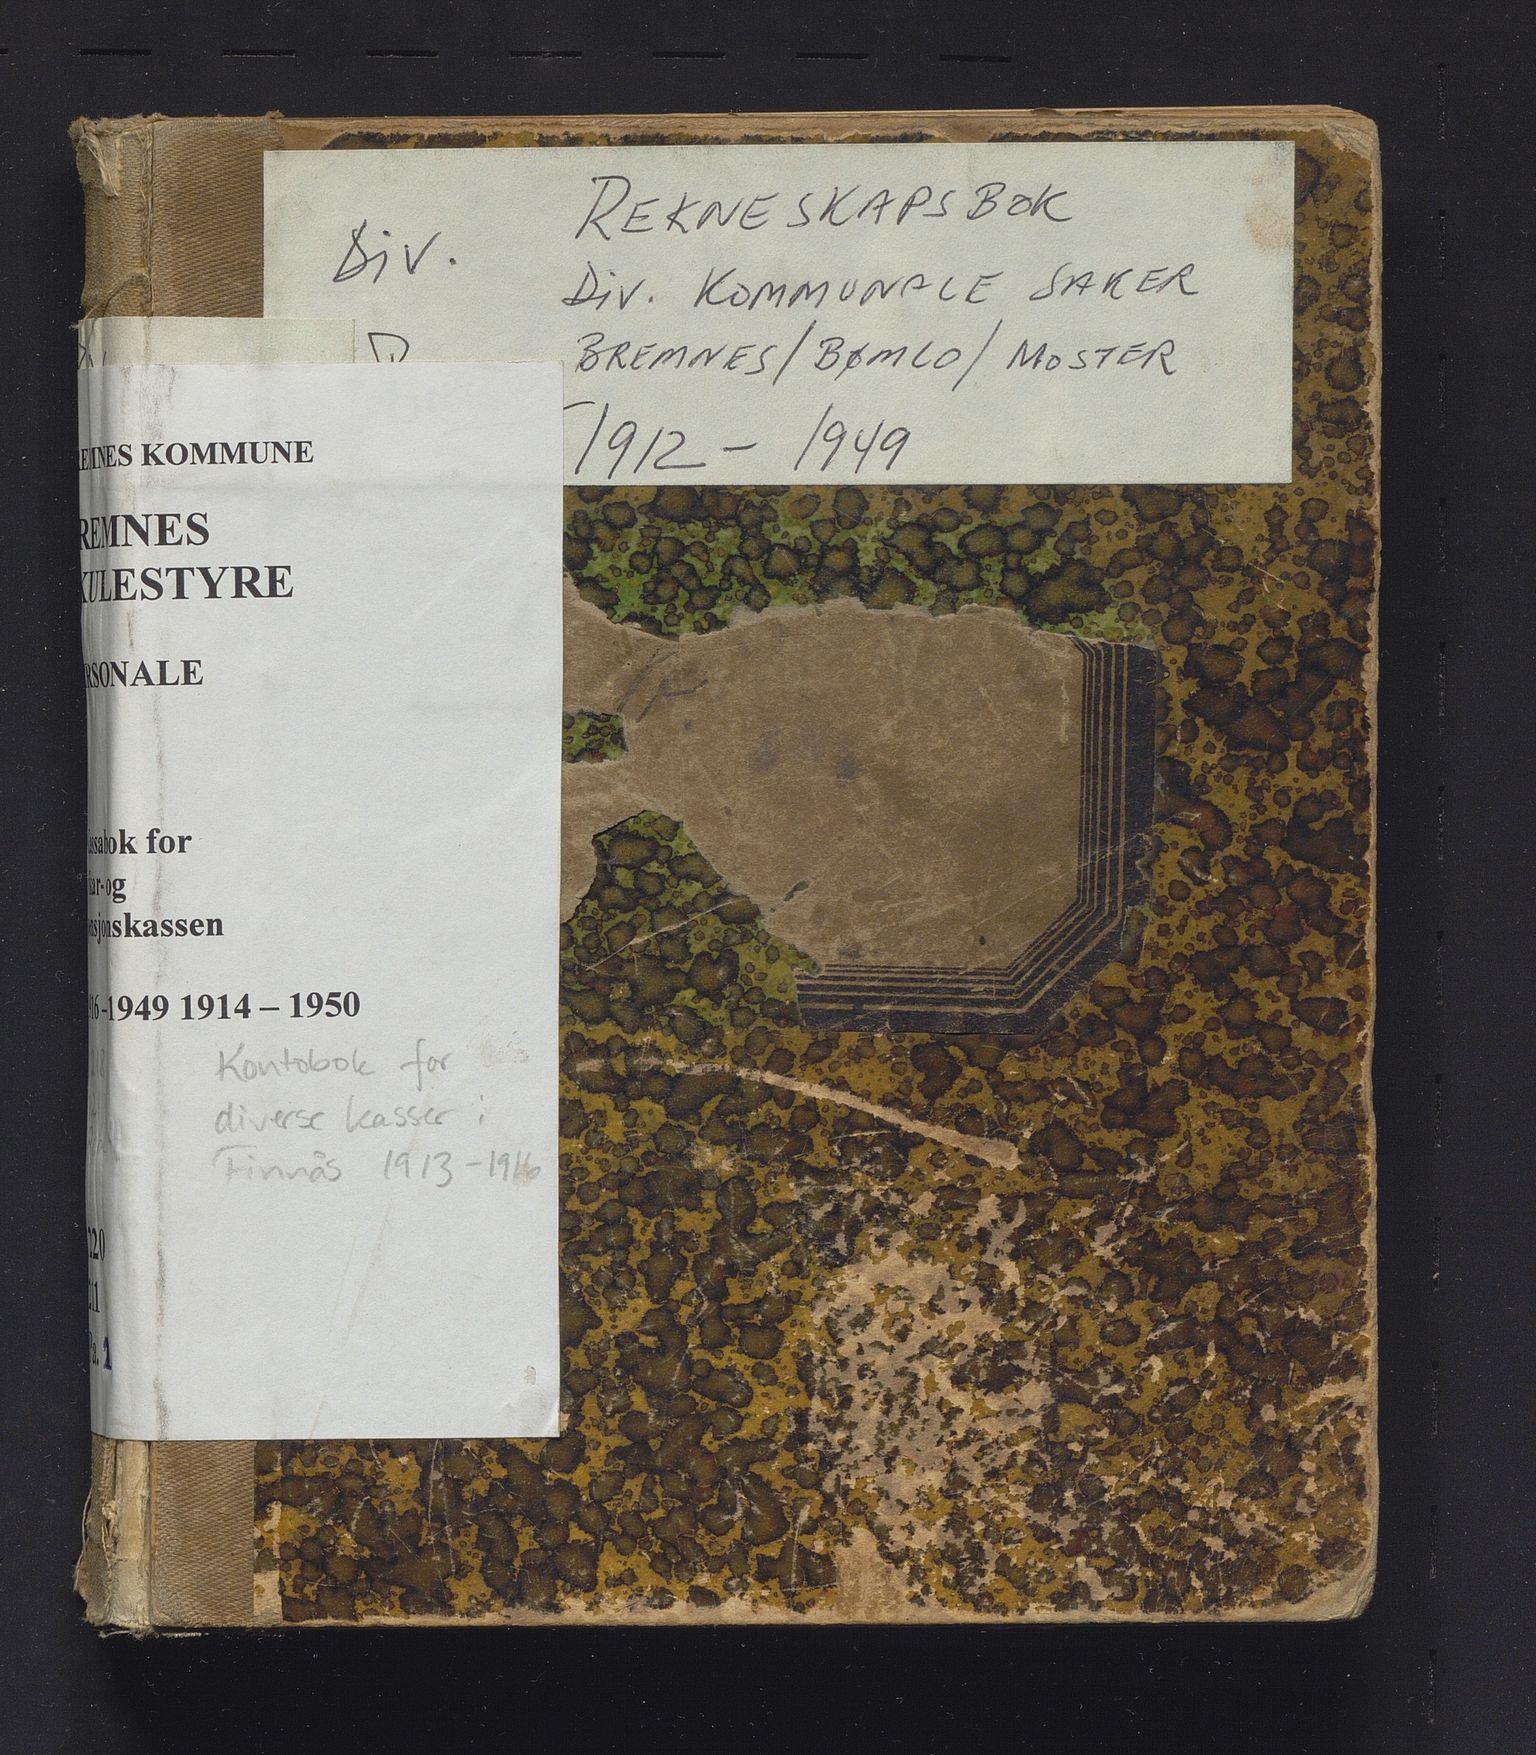 IKAH, Finnaas kommune. Heradskassen, R/Rc/Rca/L0004: Kontobok for diverse kassar, 1913-1916